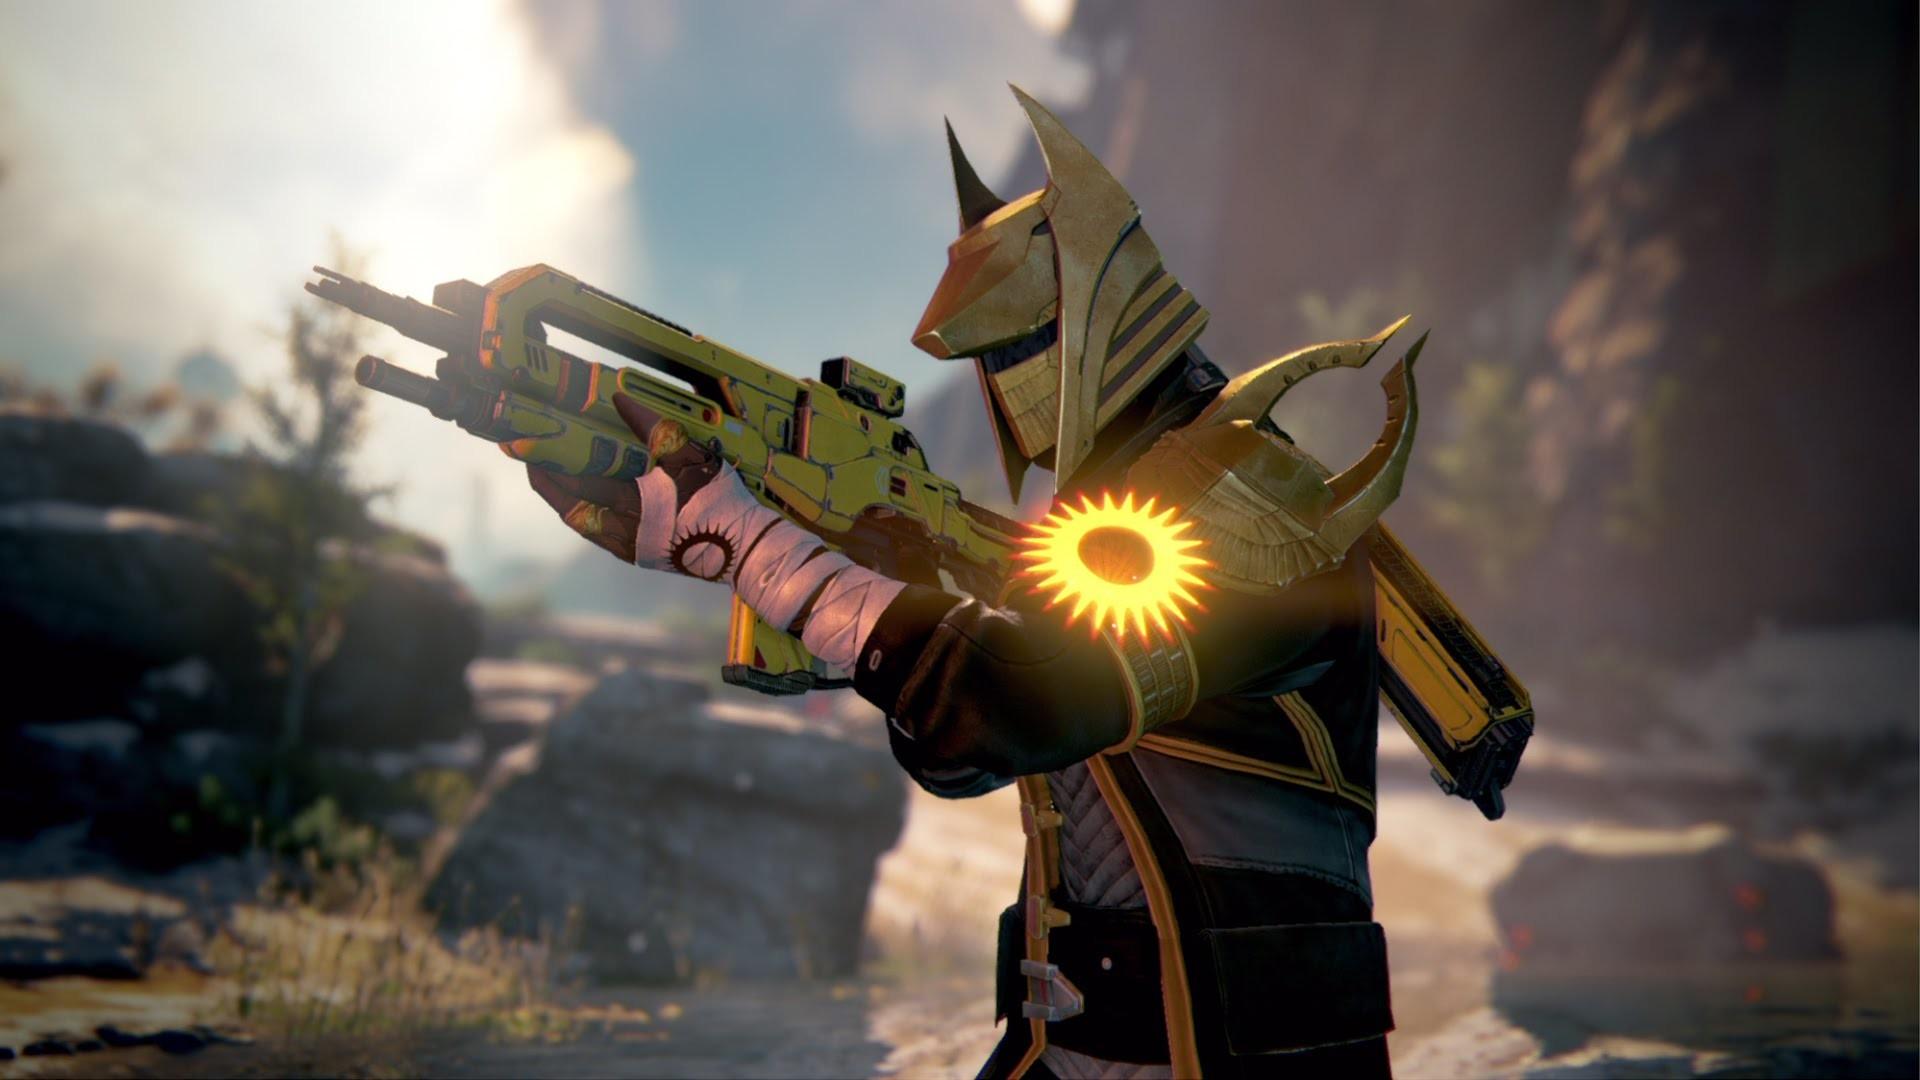 Destiny The Taken King Crucible Preview Event kicks off next week